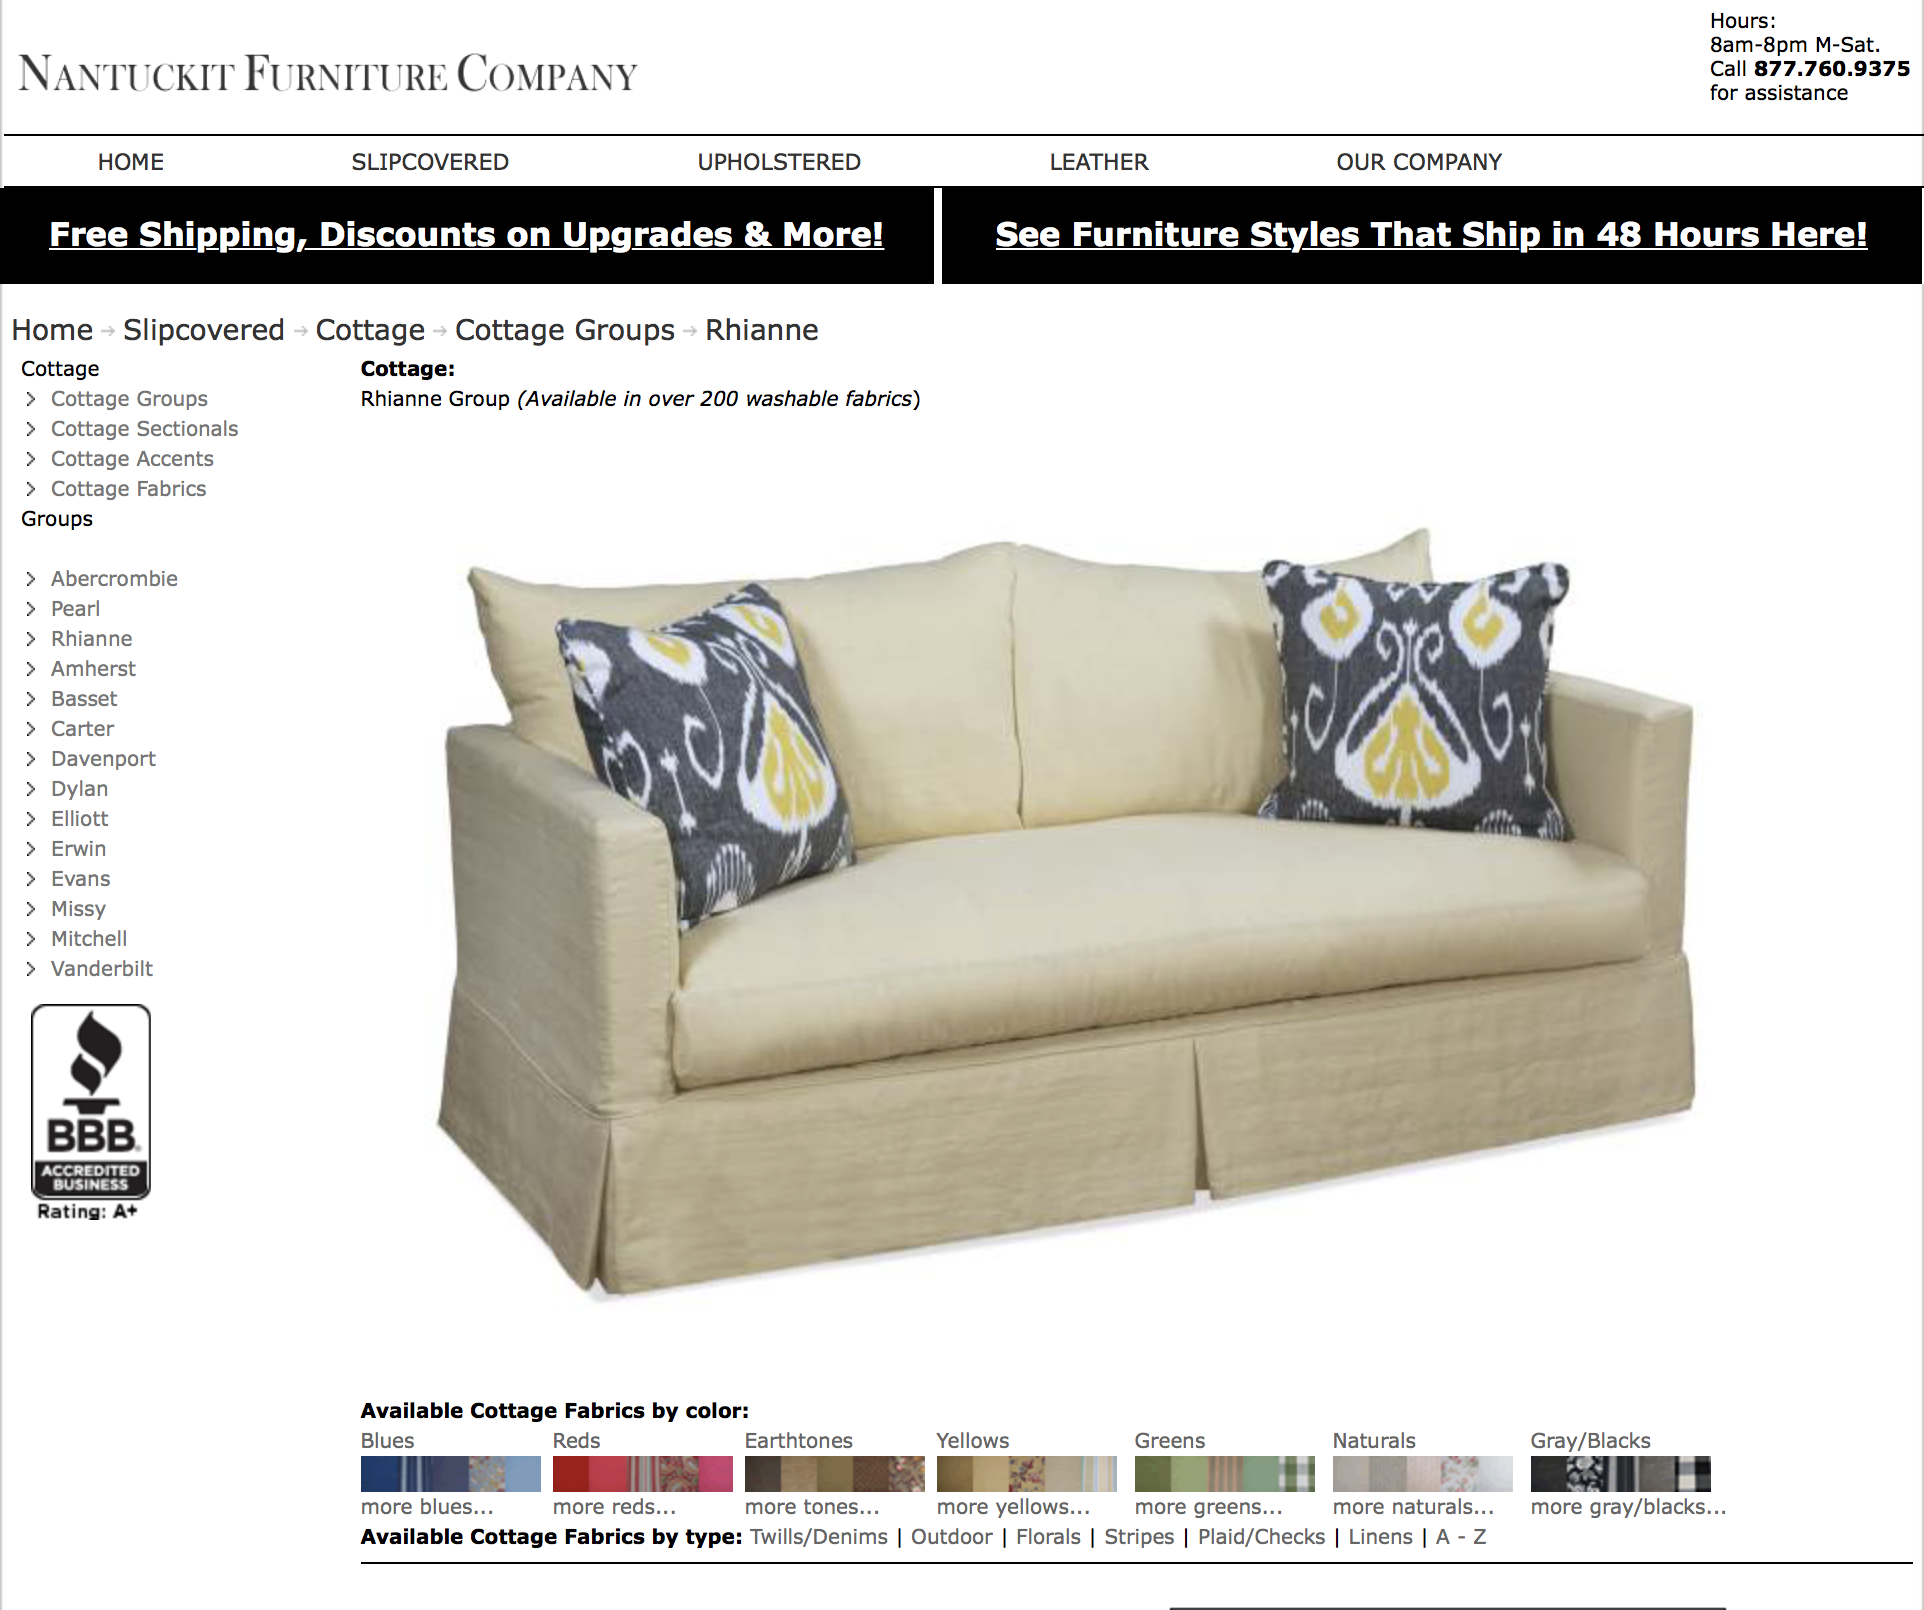 House FurnitureAlexandriaSofaElegantFabric SamplesFabric SwatchesCome  InToss PillowsTossed